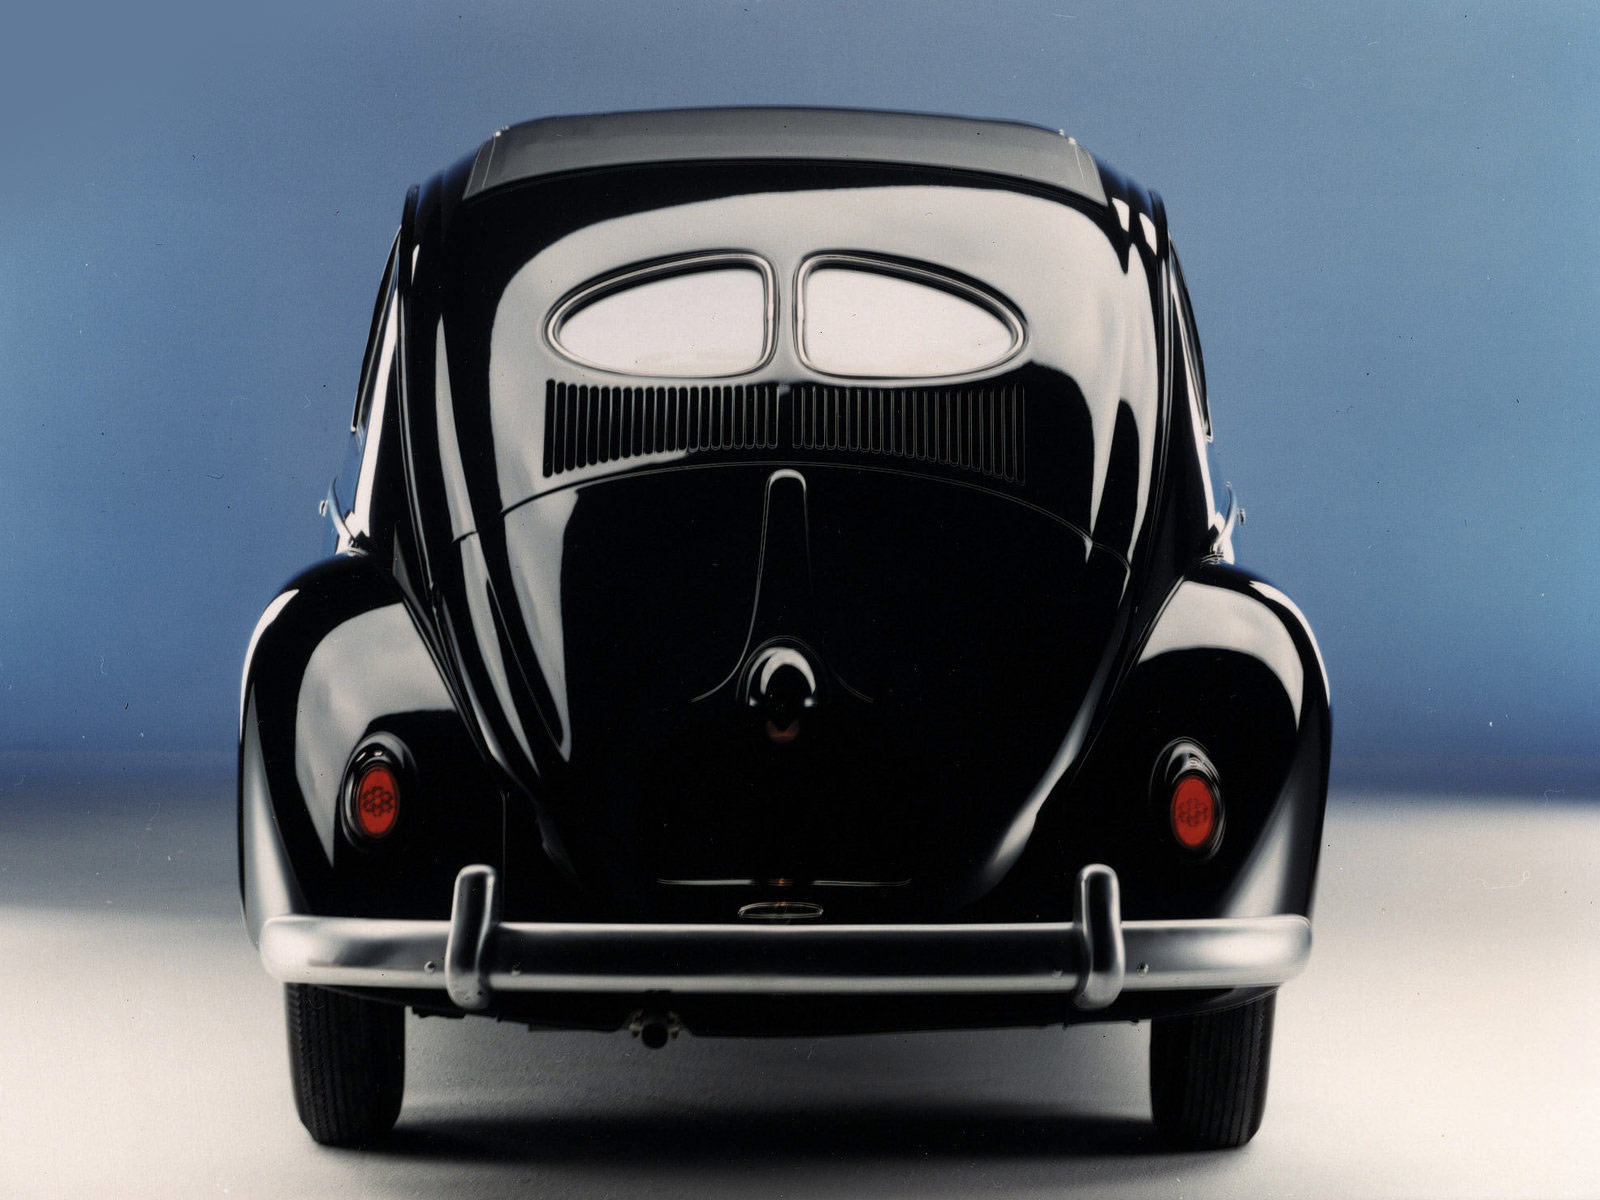 Cars Wallpaper With Names 1938 Vw Beetle Volkswagen Car Desktop Wallpaper